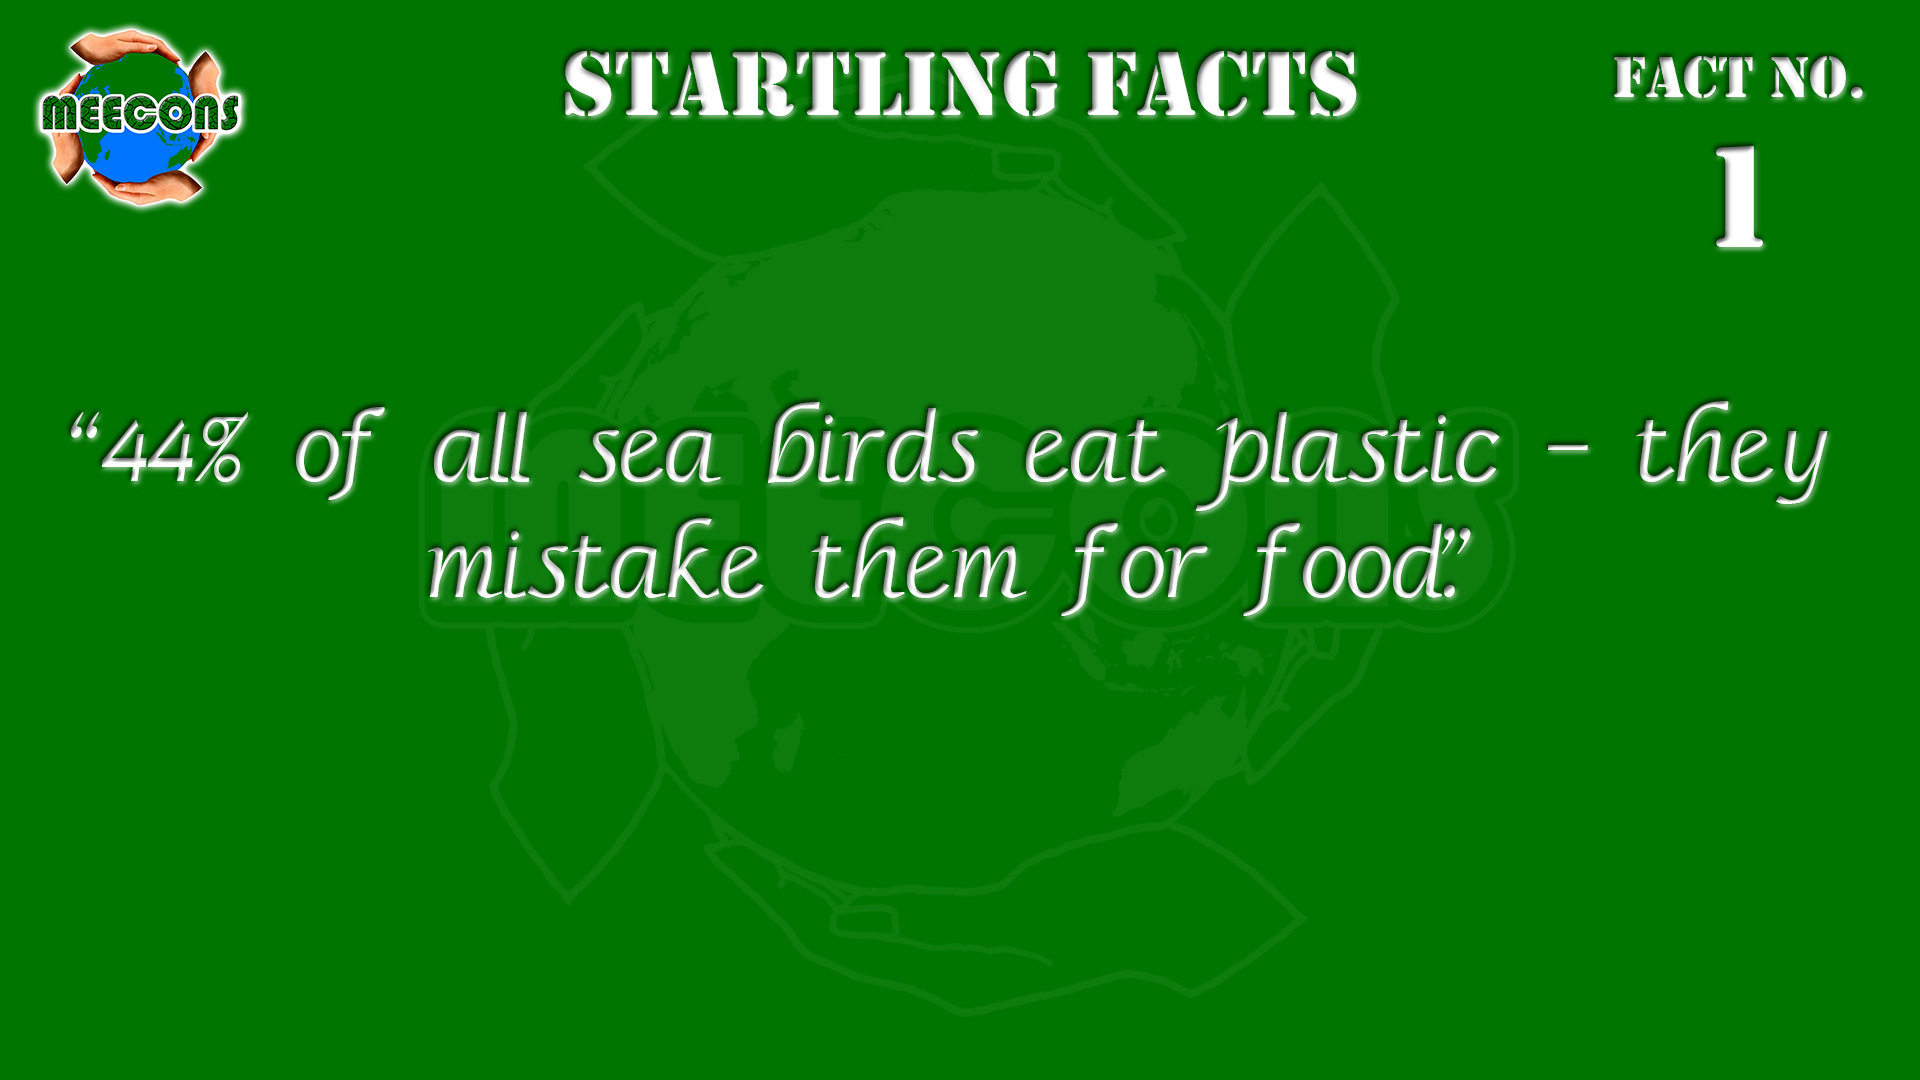 Startling Fact 1